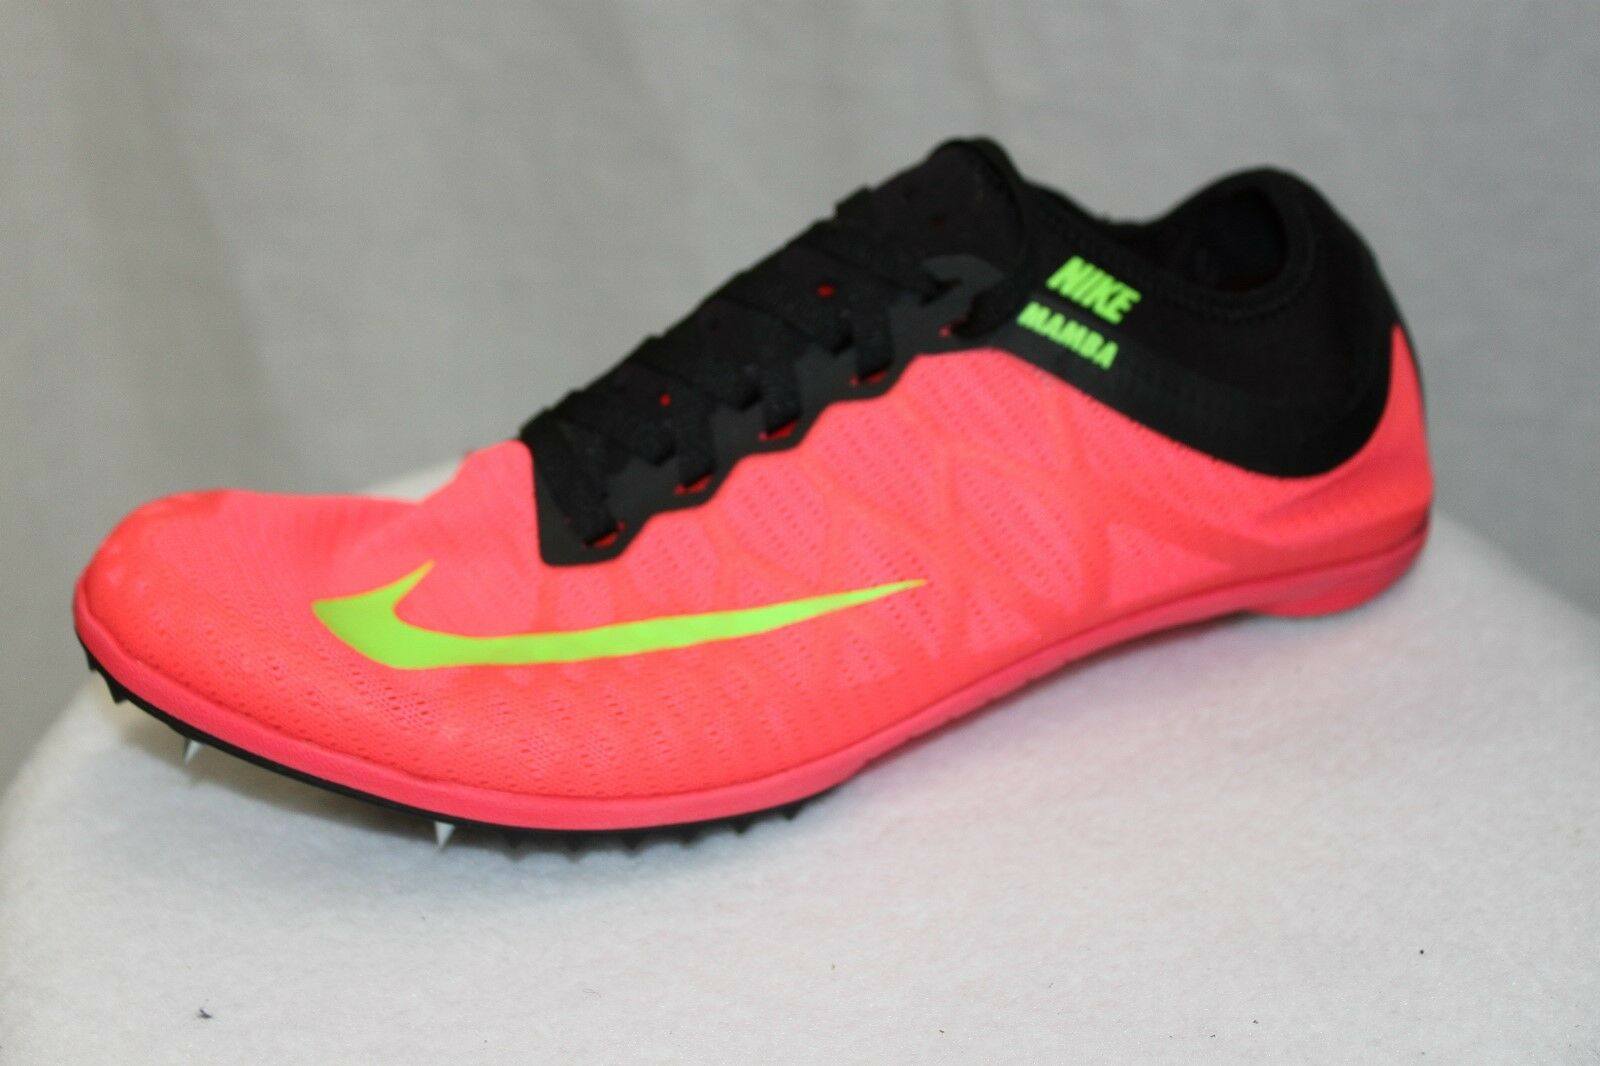 Nike zoom mamba 3  finden frauen 800-5000 msrp msrp 800-5000 120 neue spitzen 8aa38b